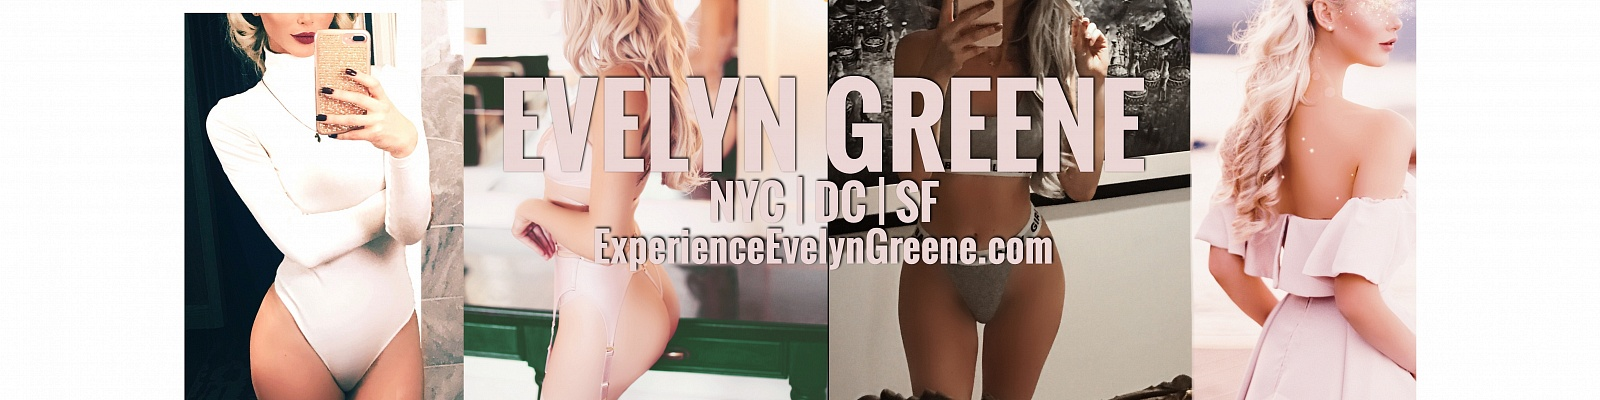 Evelyn Greene's Cover Photo